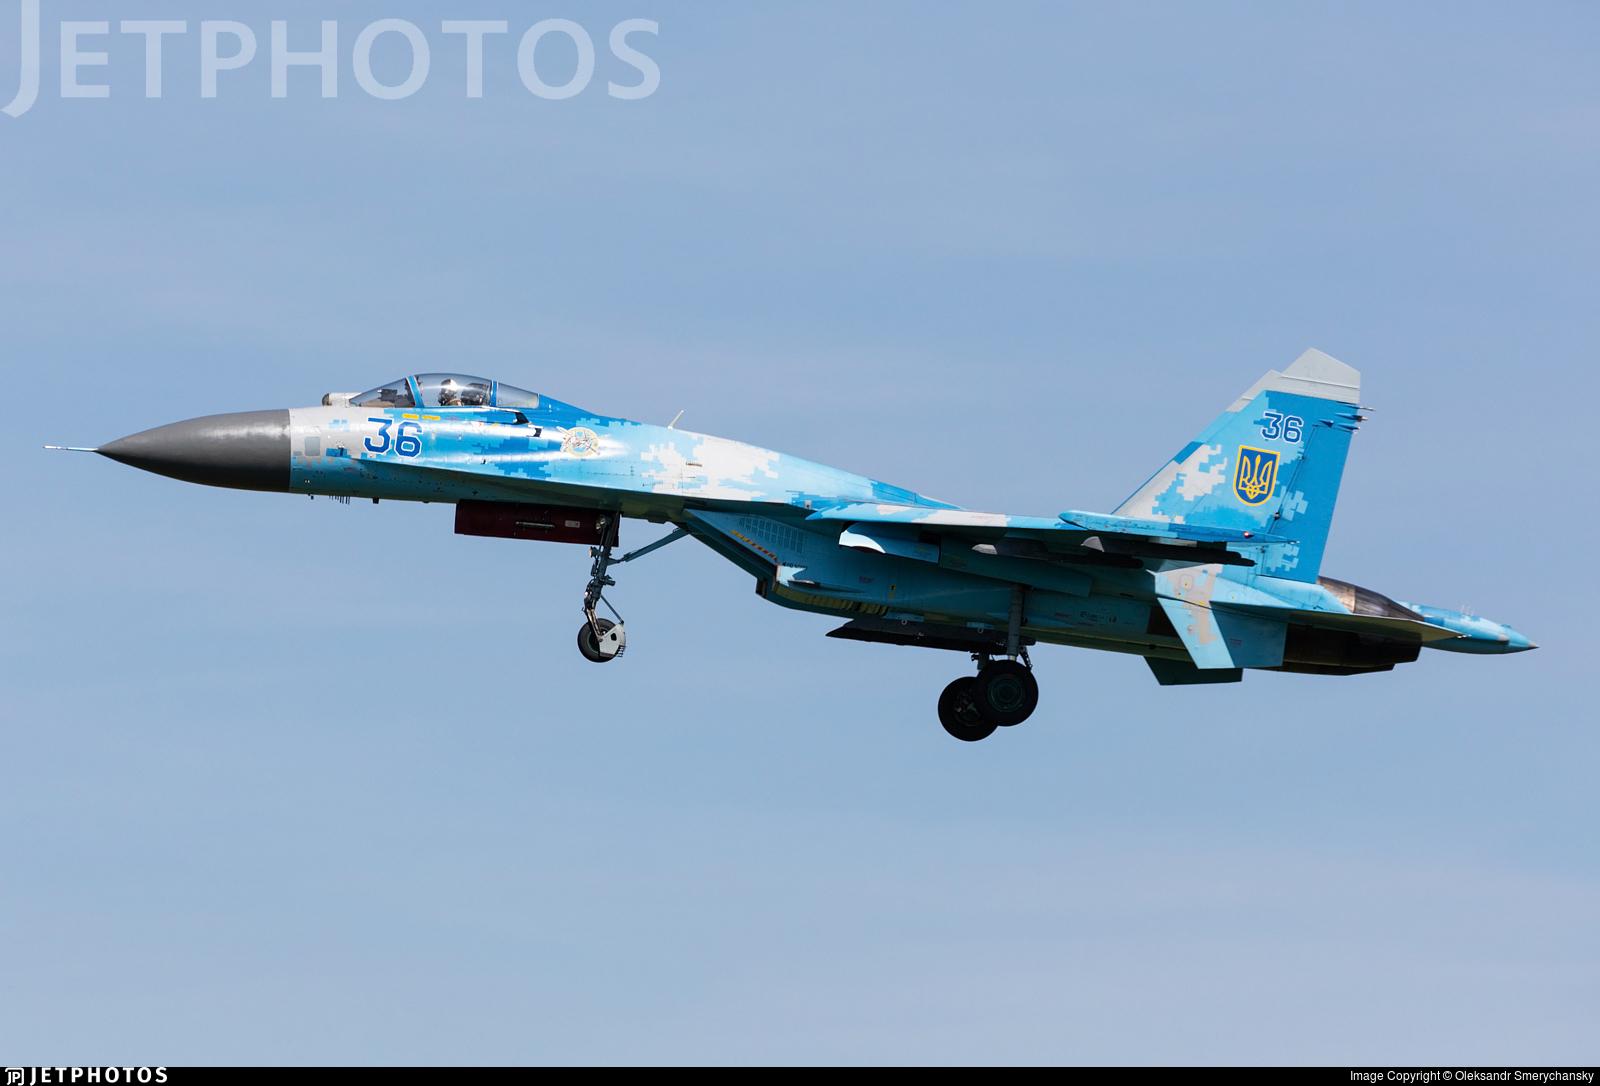 36 - Sukhoi Su-27 Flanker - Ukraine - Air Force